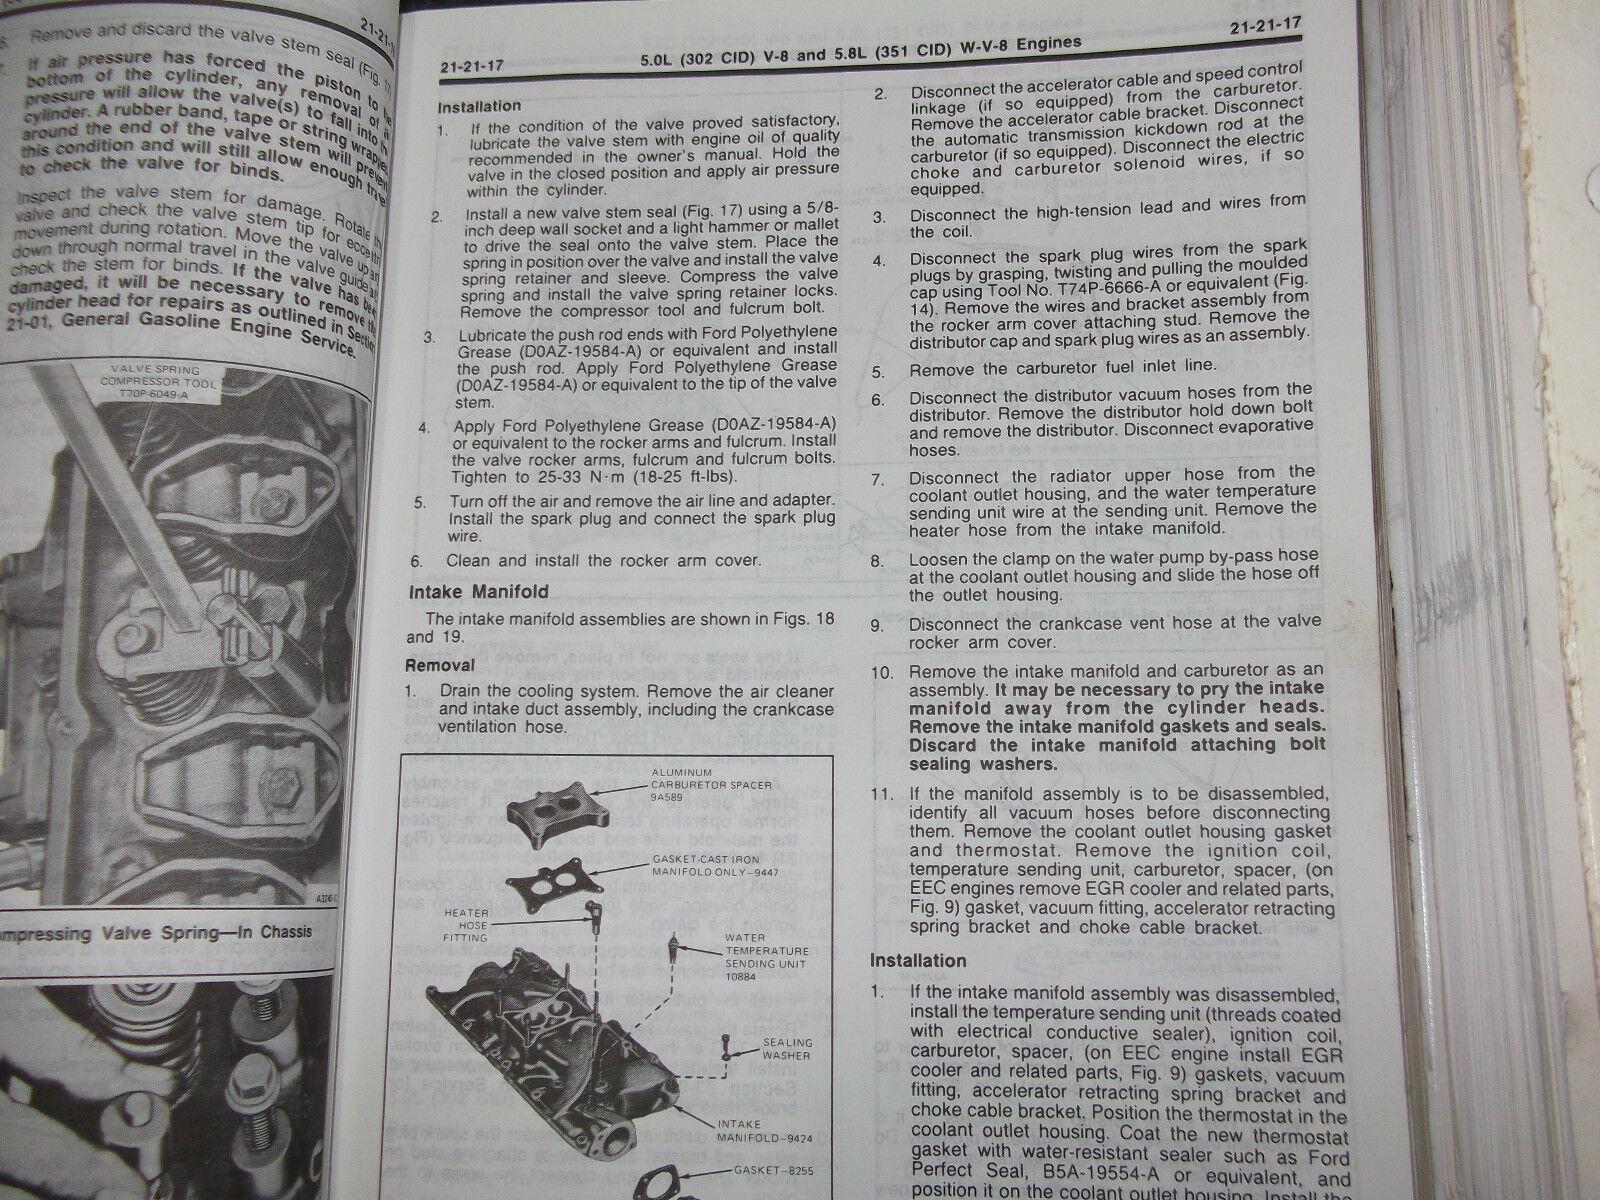 1984 Ford F-150 F150 250 350 F350 Bronco Truck Service Shop Repair Manual Set image 6